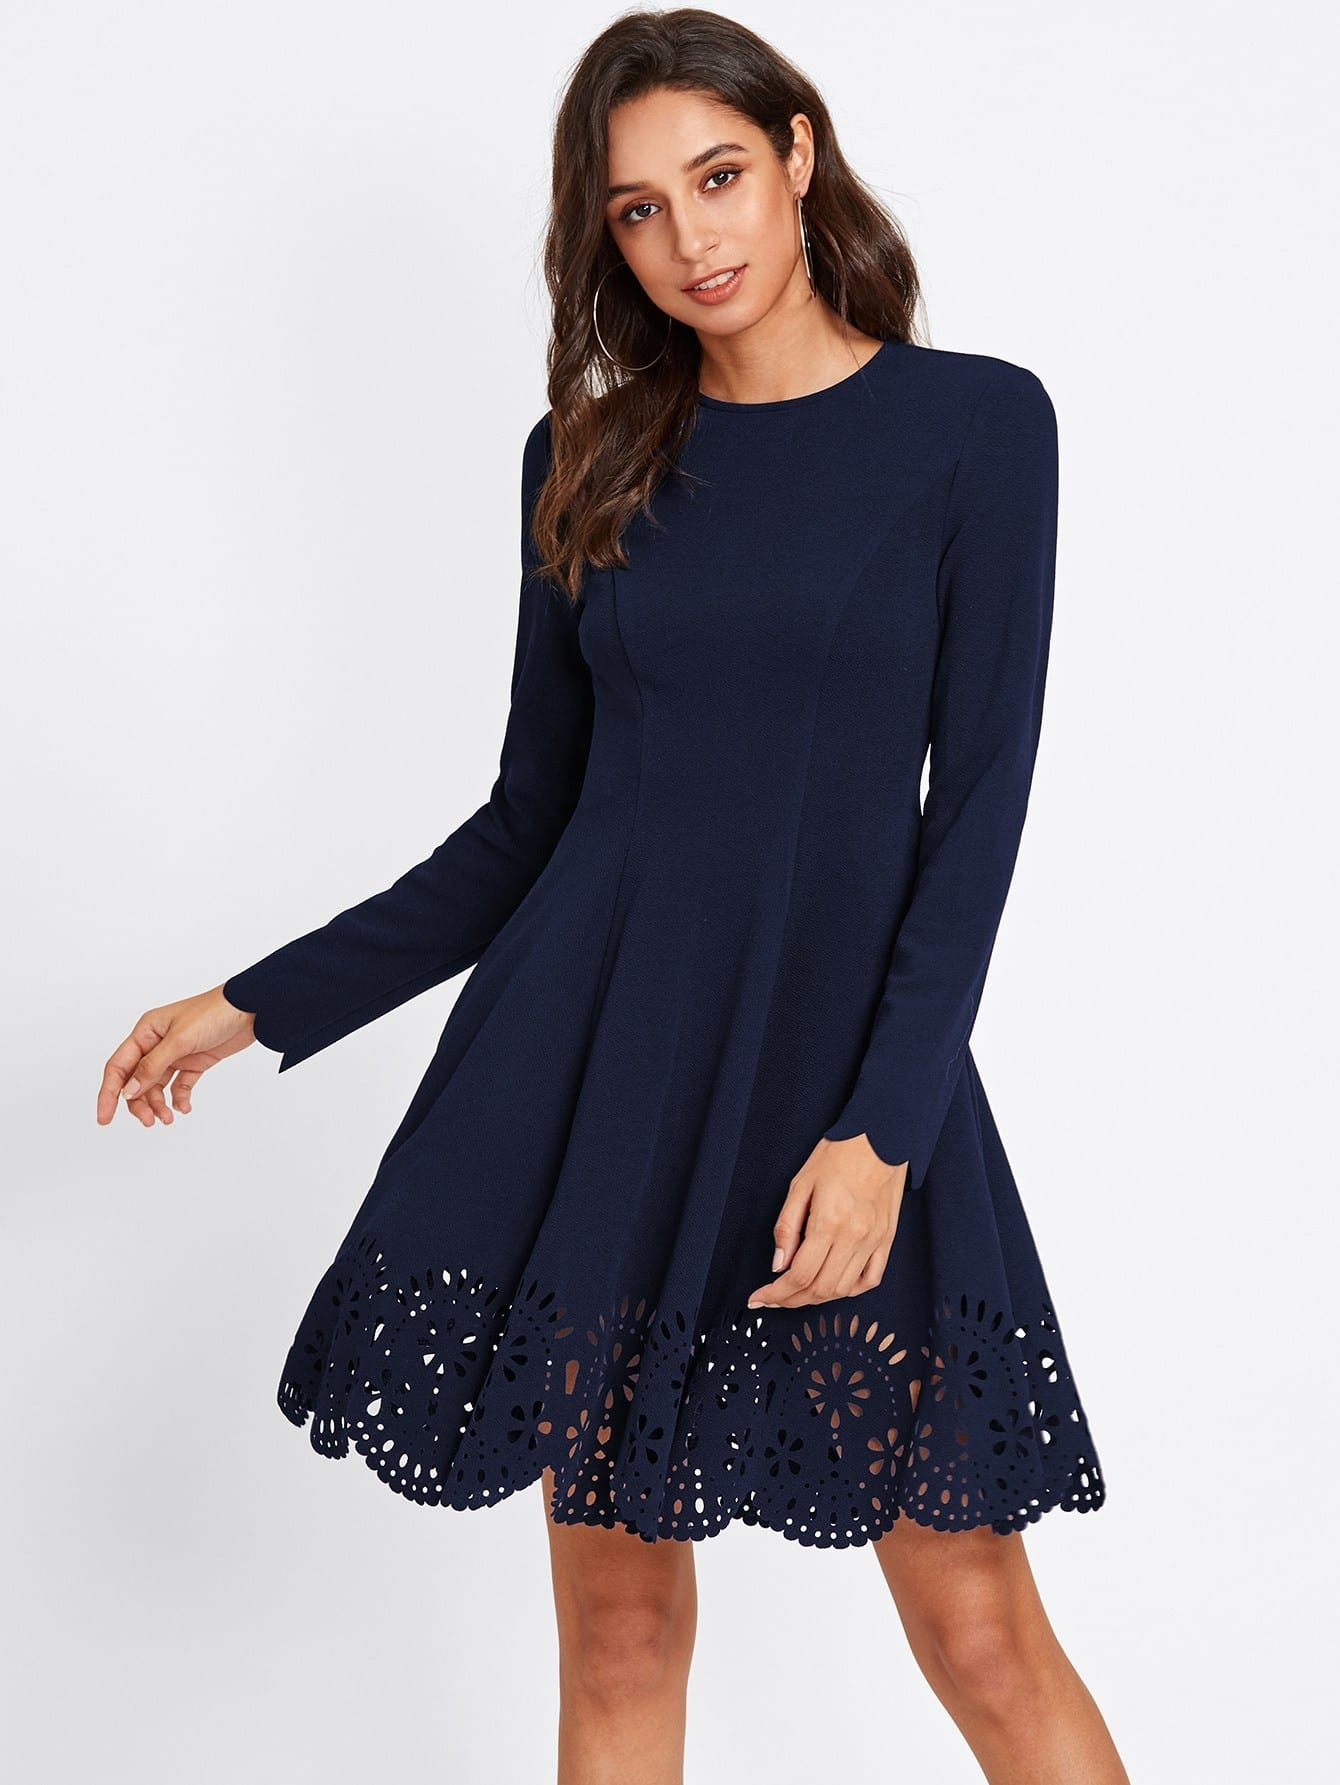 Scallop Laser Cut Hem Fit & Flare Dress scallop laser cut form fitting dress